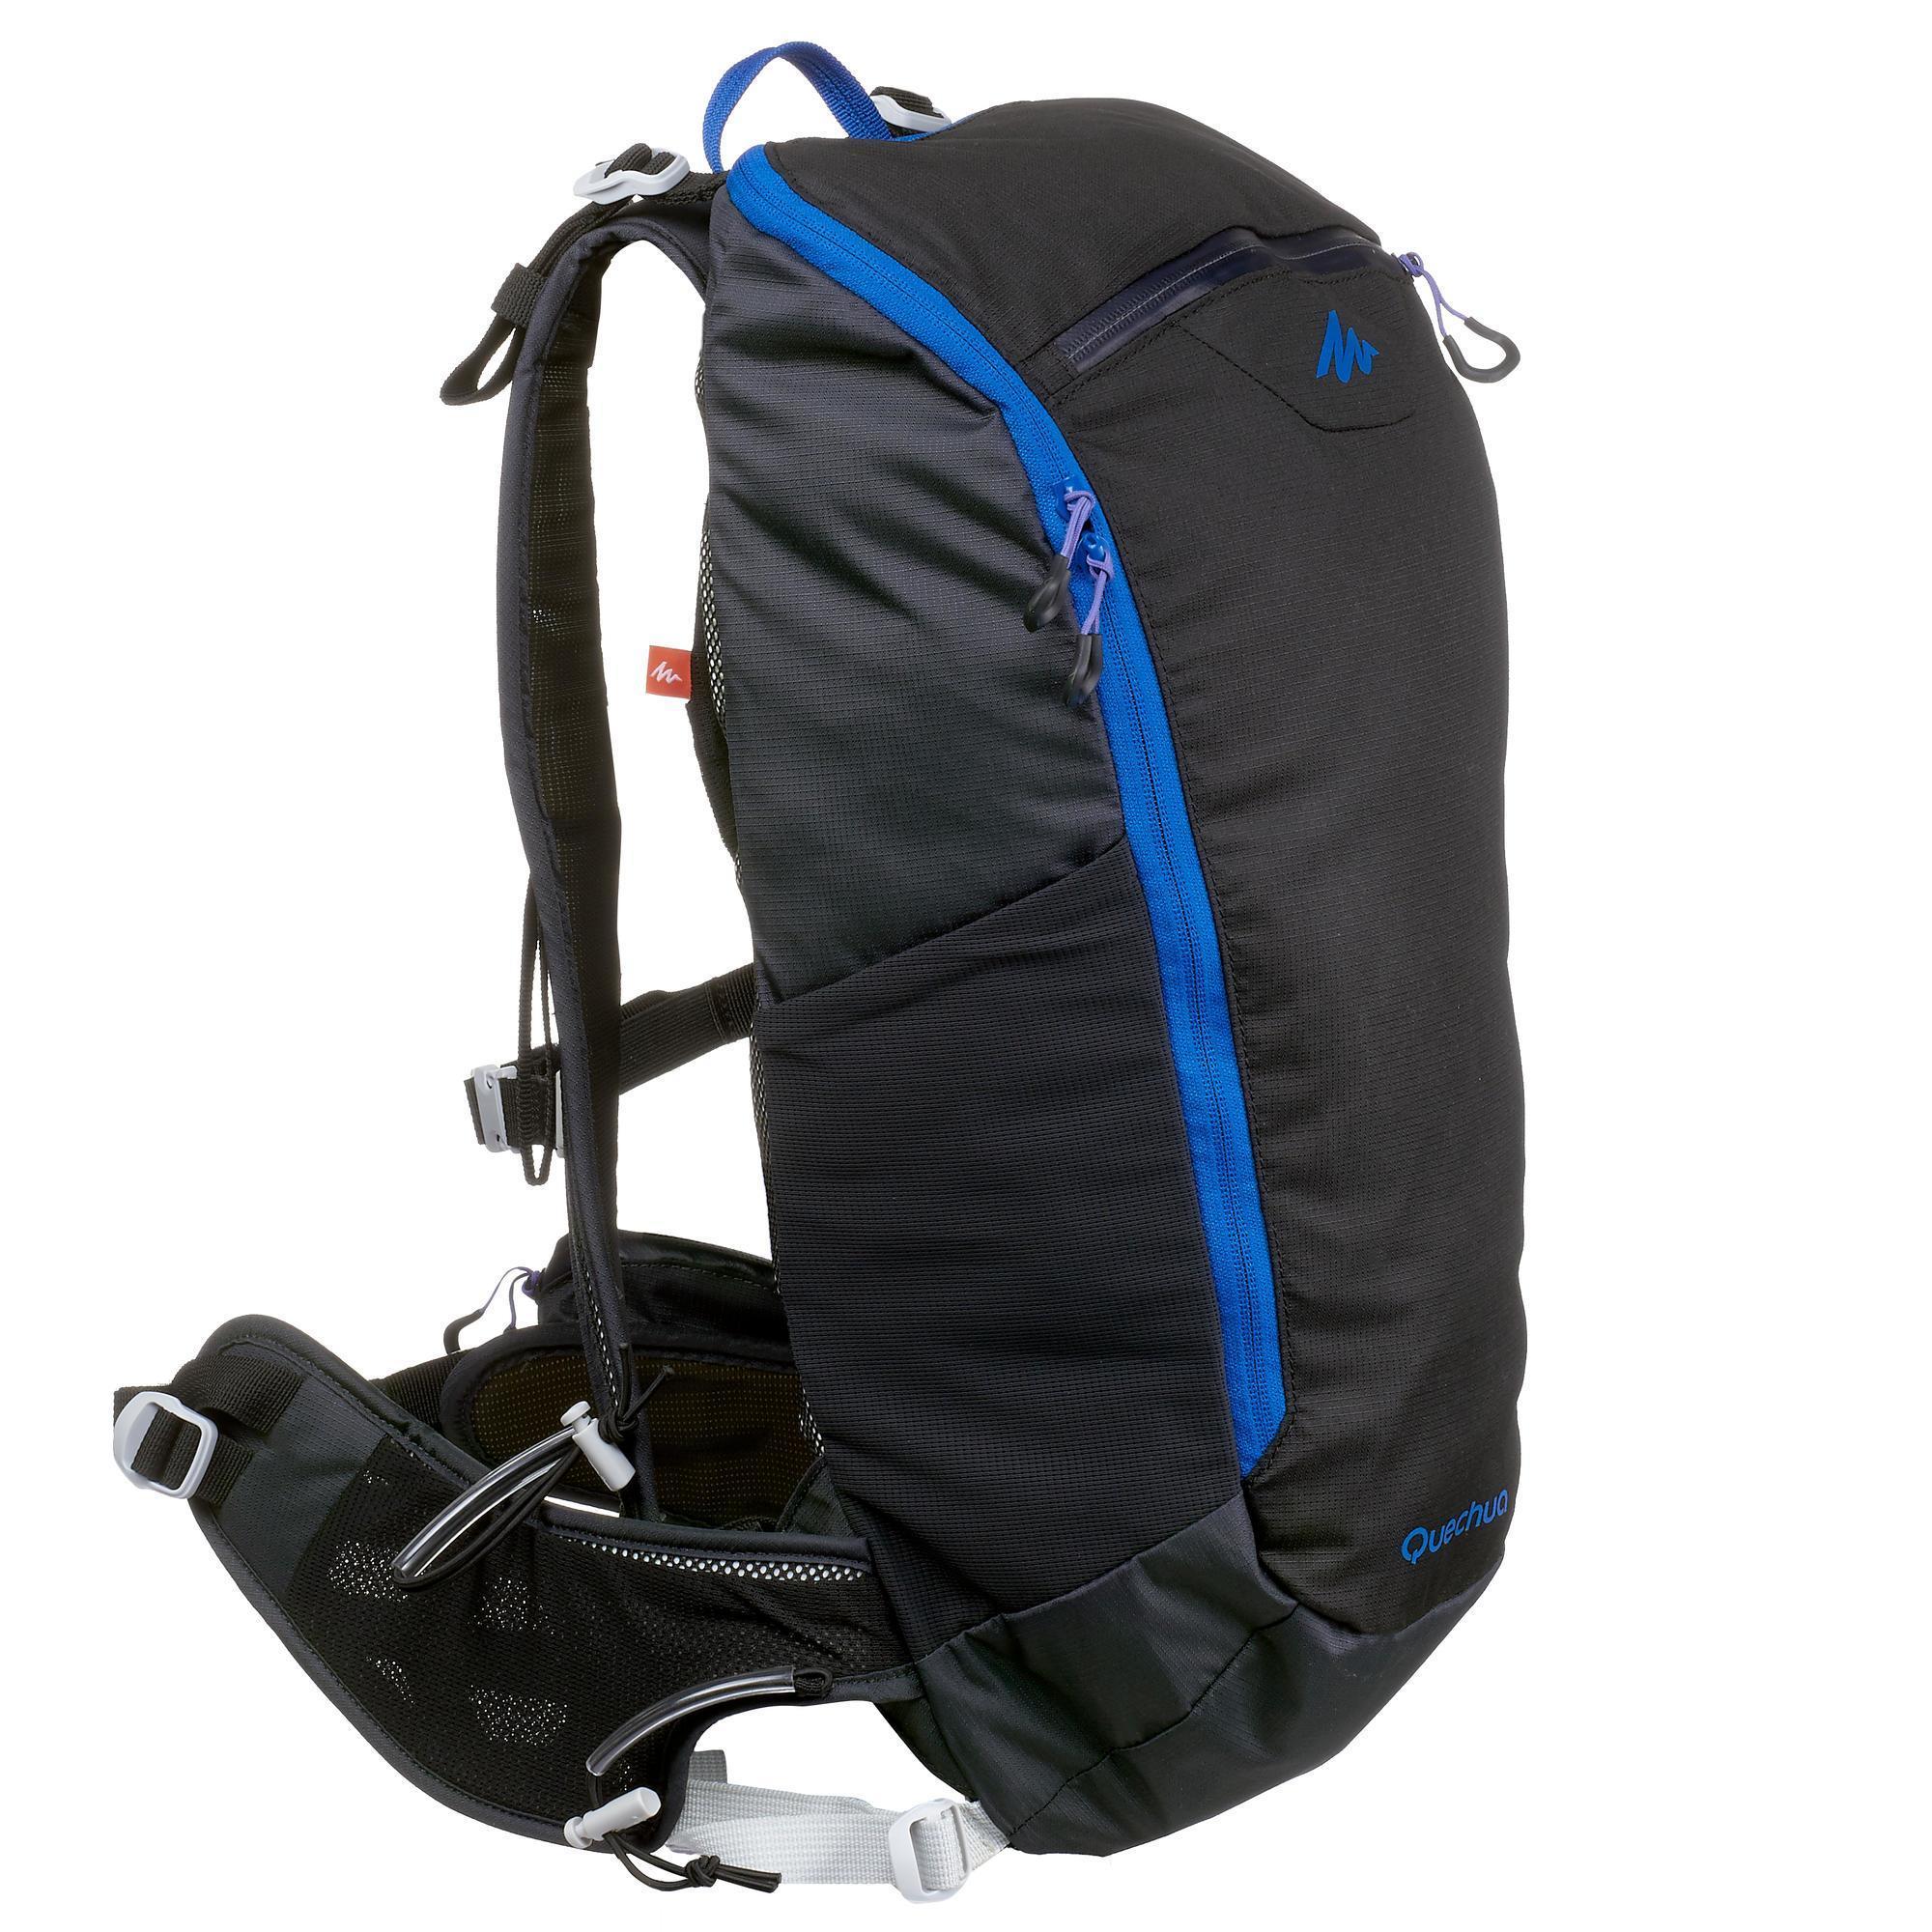 (Decathlon) Wanderrucksack Speed Hiking FH500 Helium 15 Liter